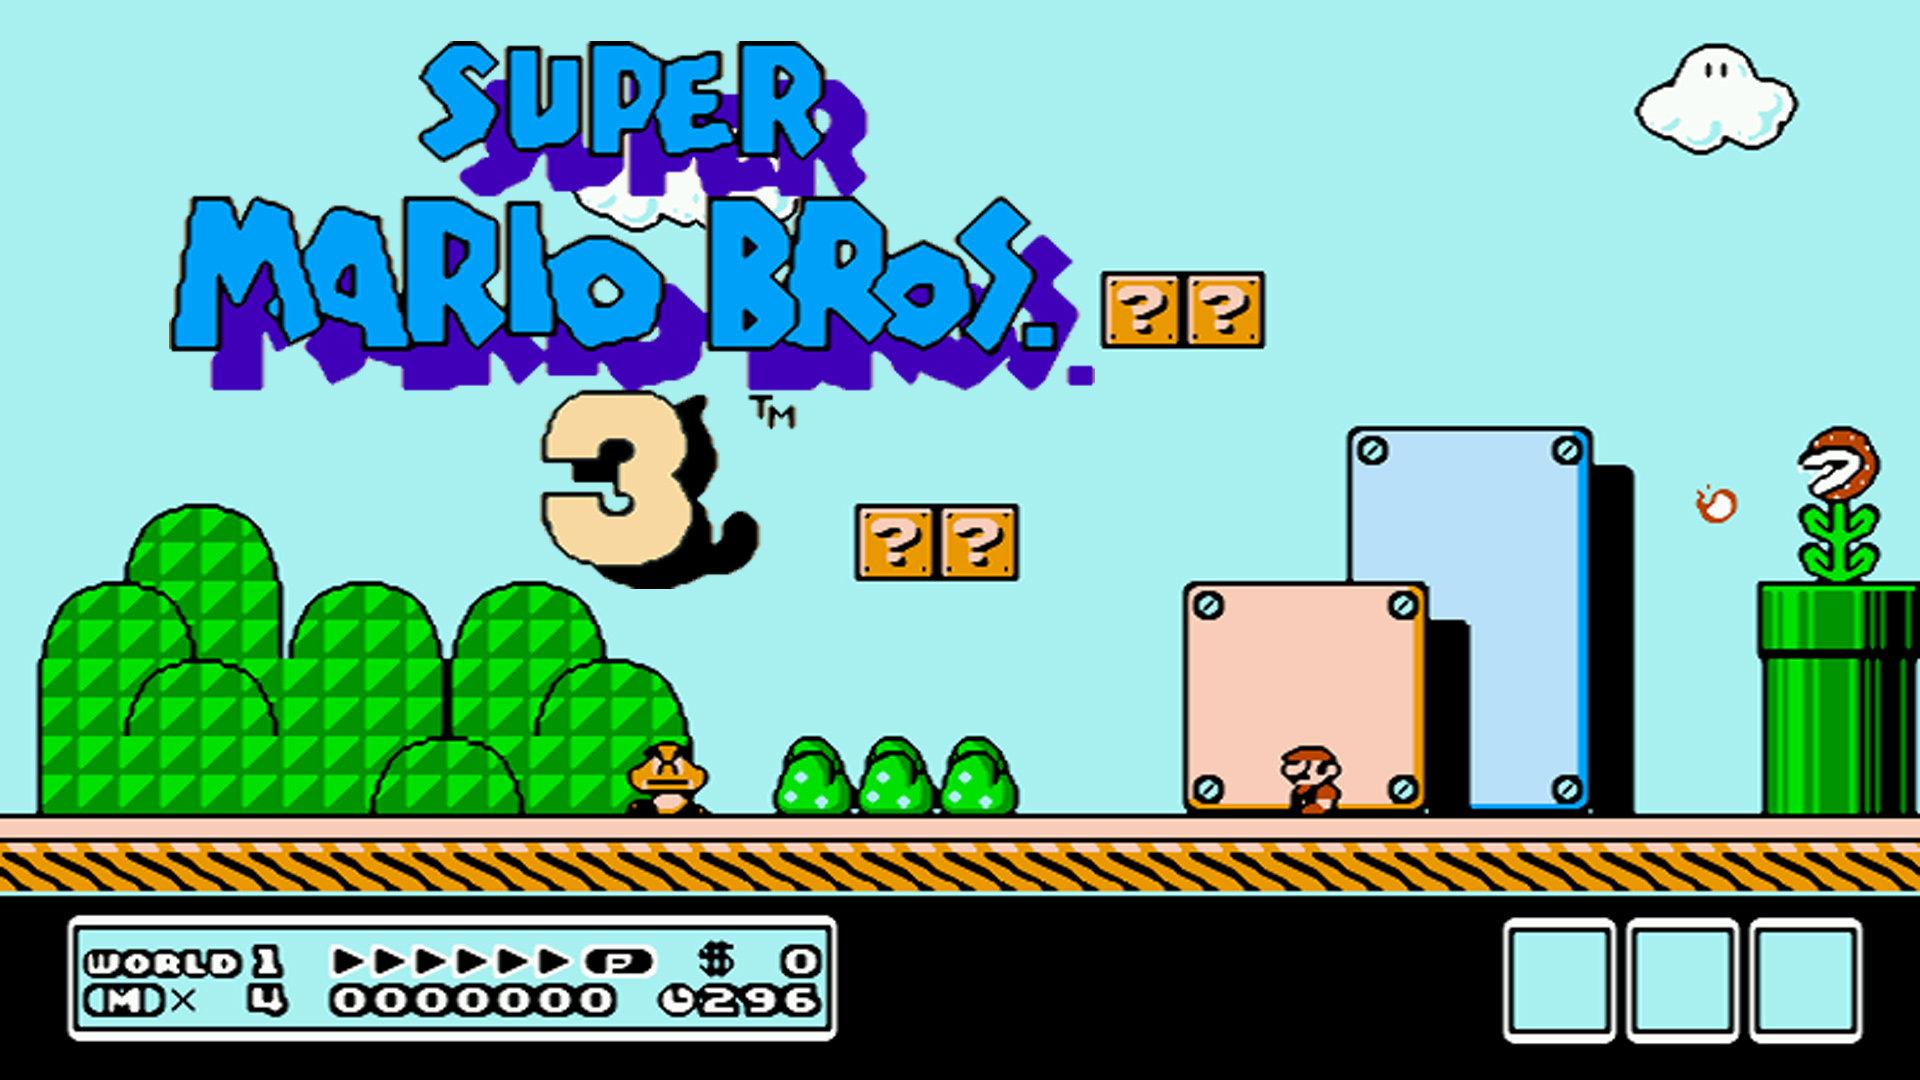 Free Download Super Mario Bros 3 Wallpaper Id 399325 Full Hd For